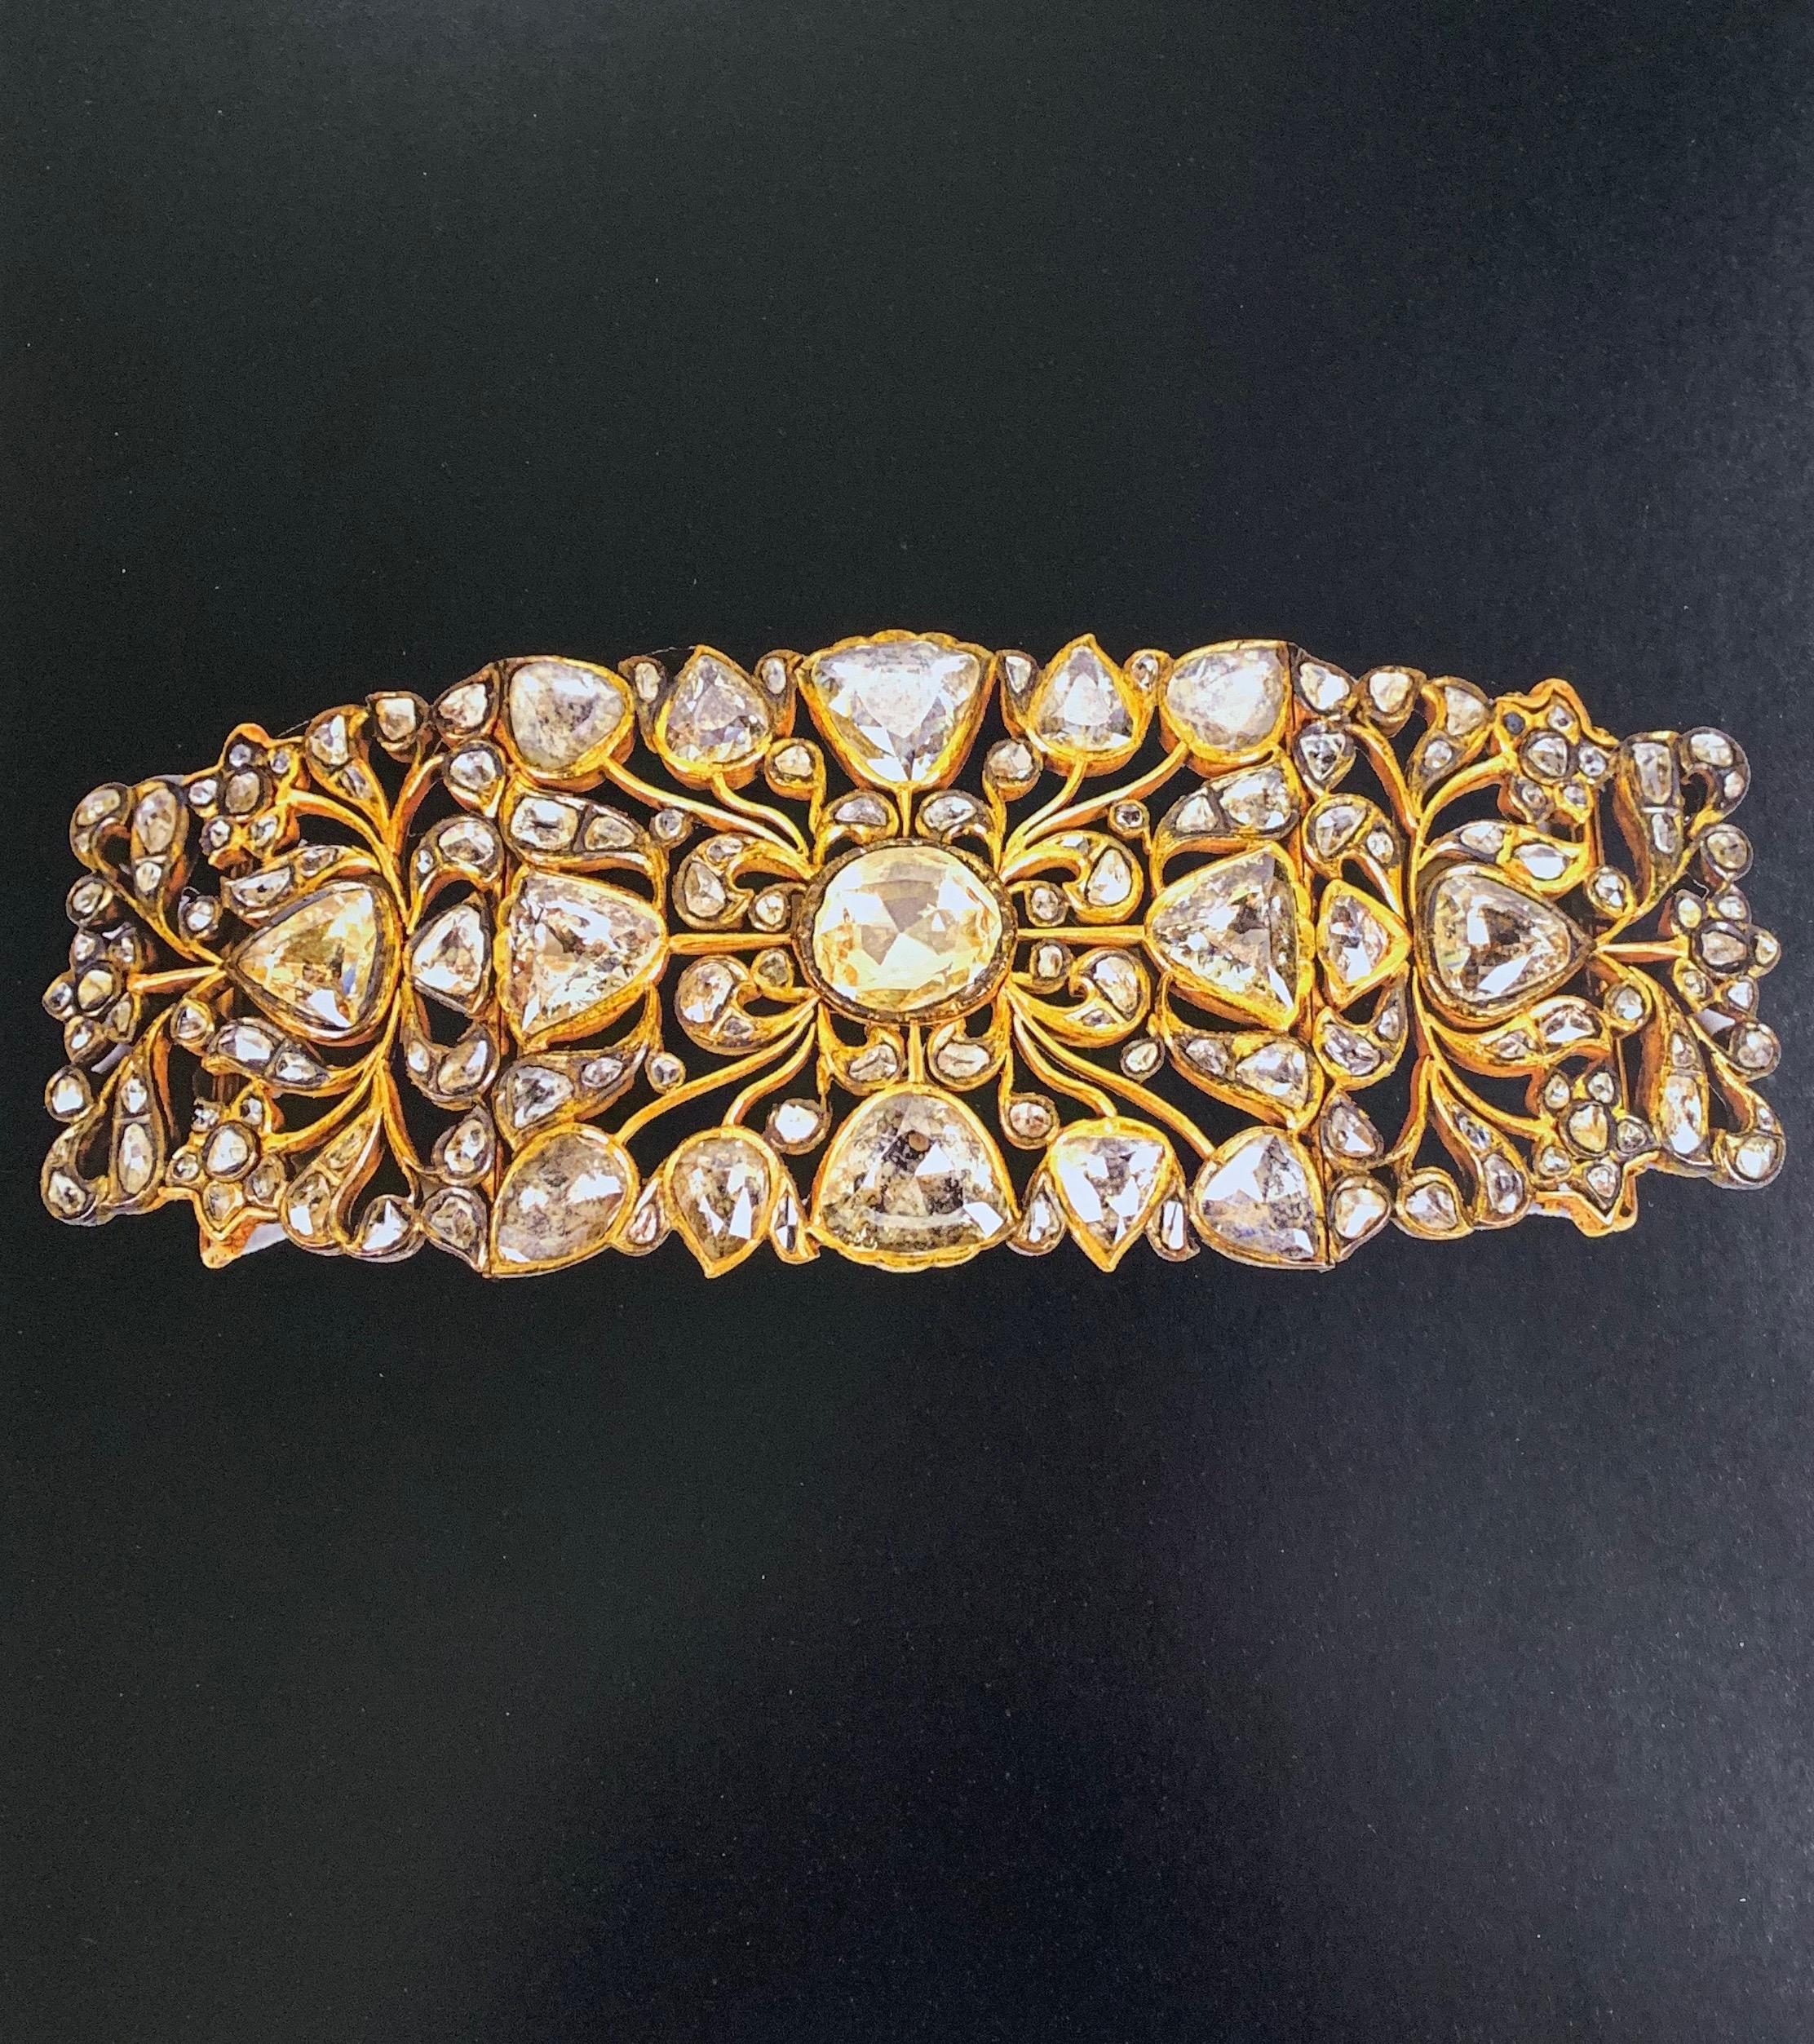 Baglus Almas -- Gold buckle set with diamonds